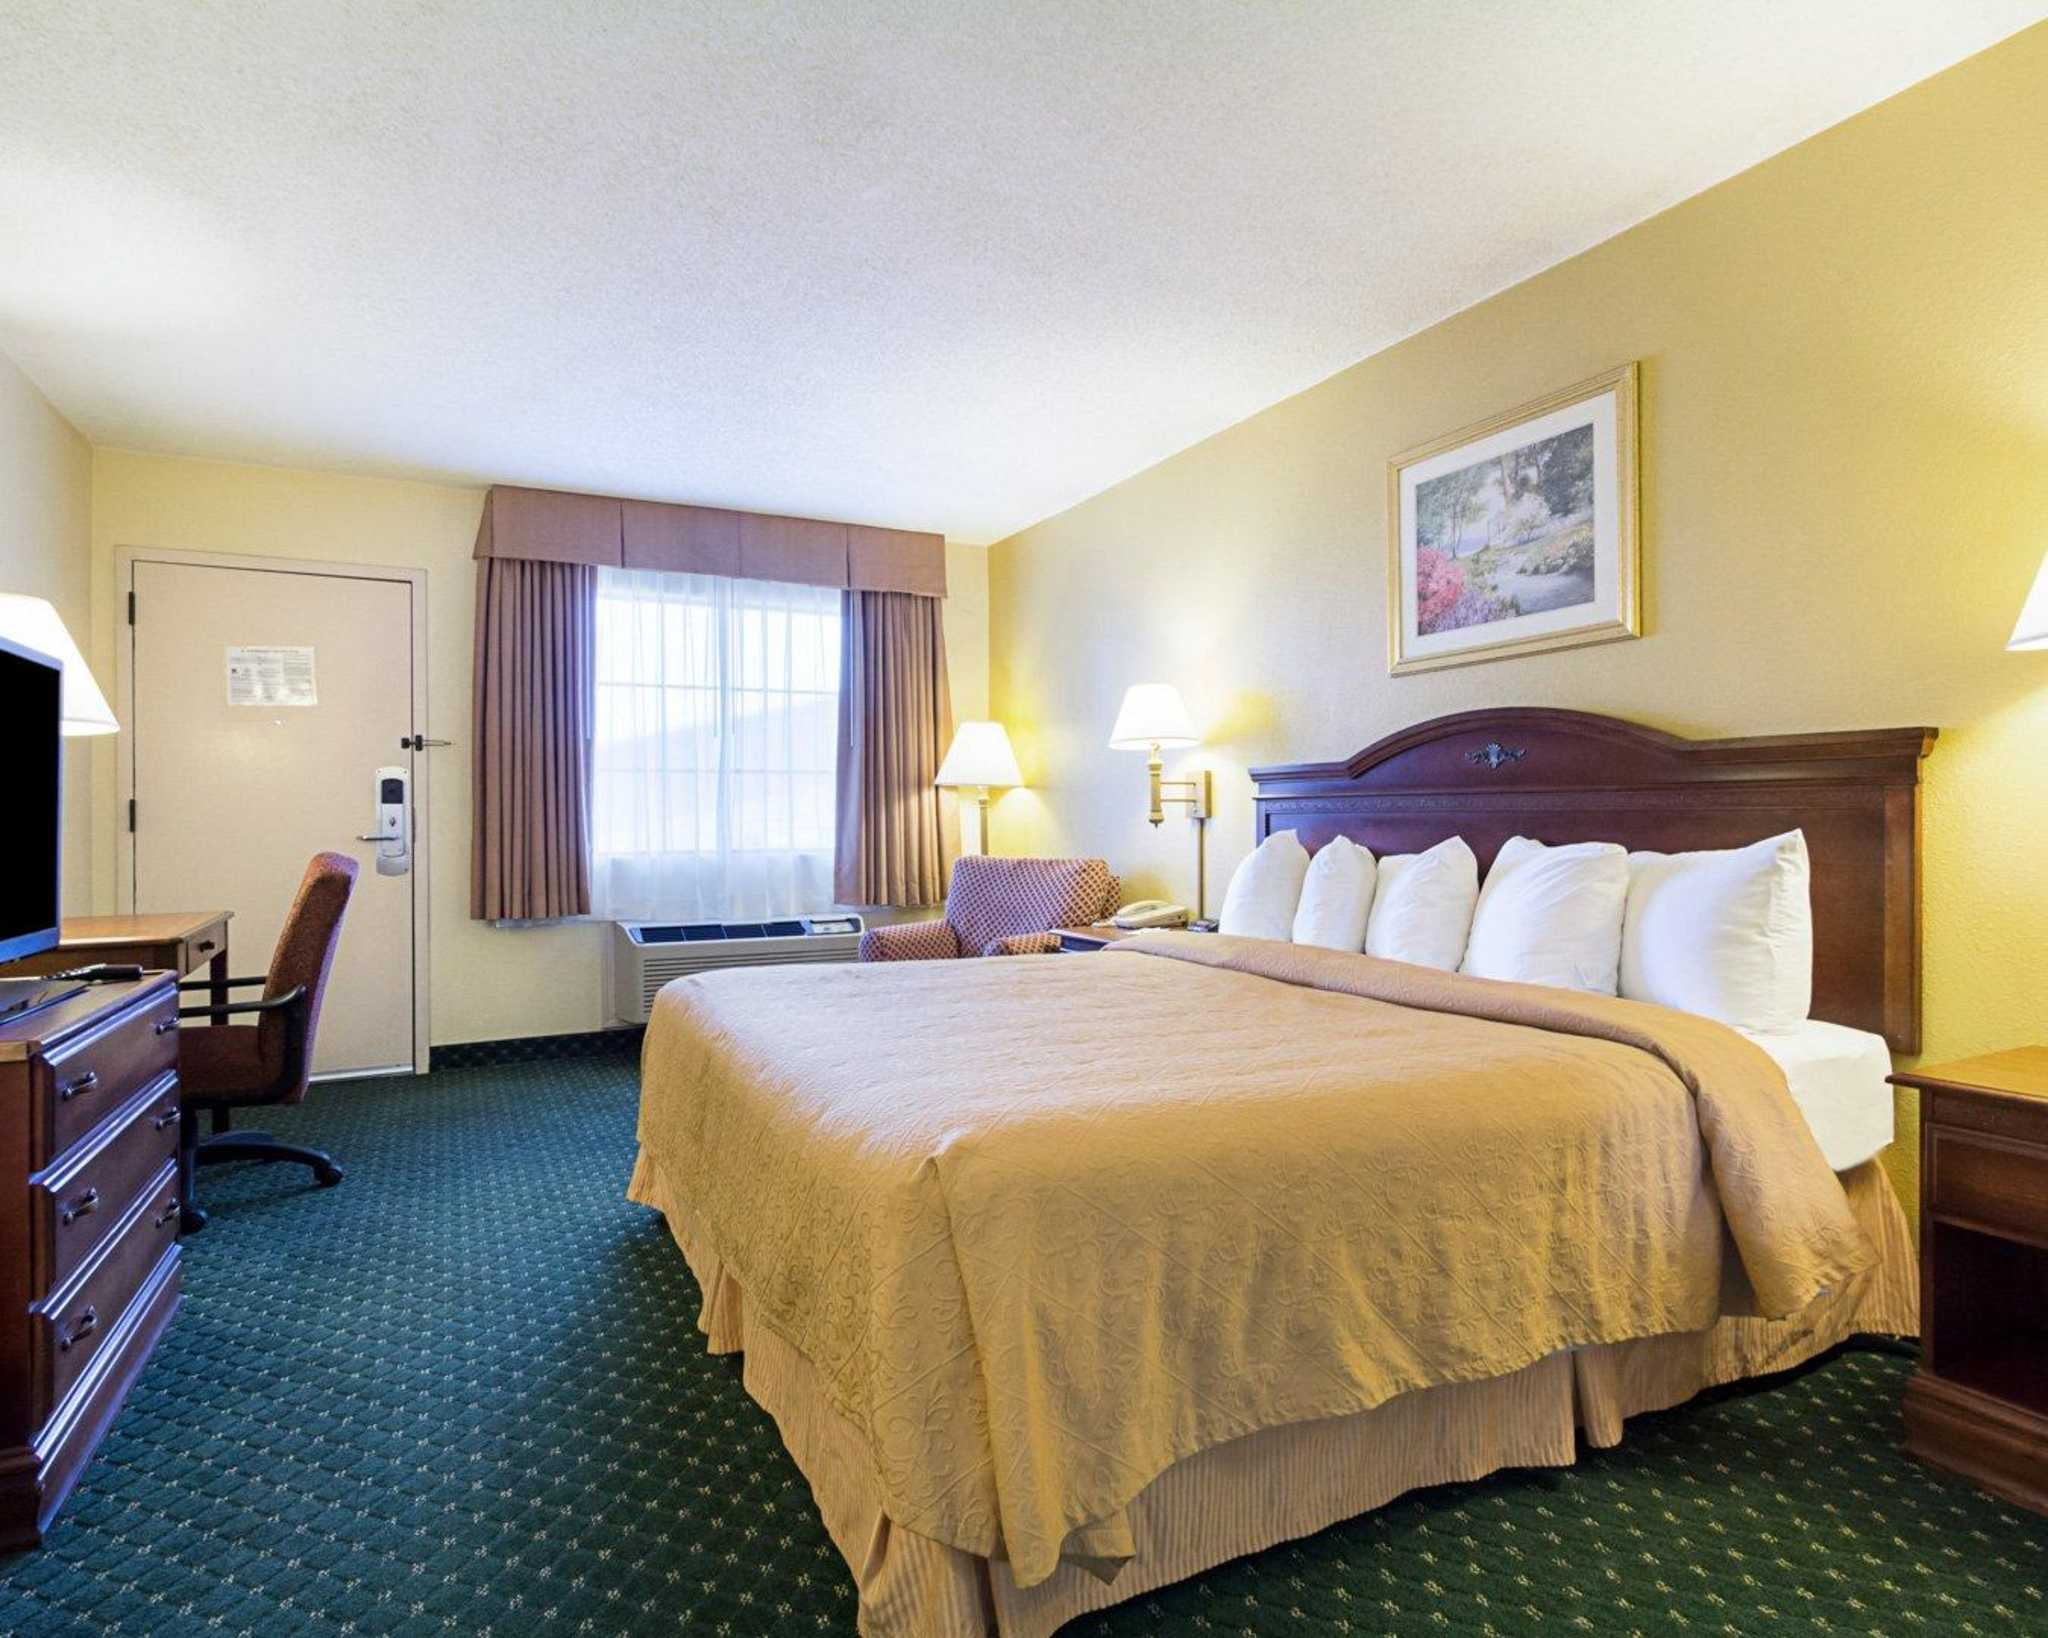 Quality Inn & Suites Southwest image 32